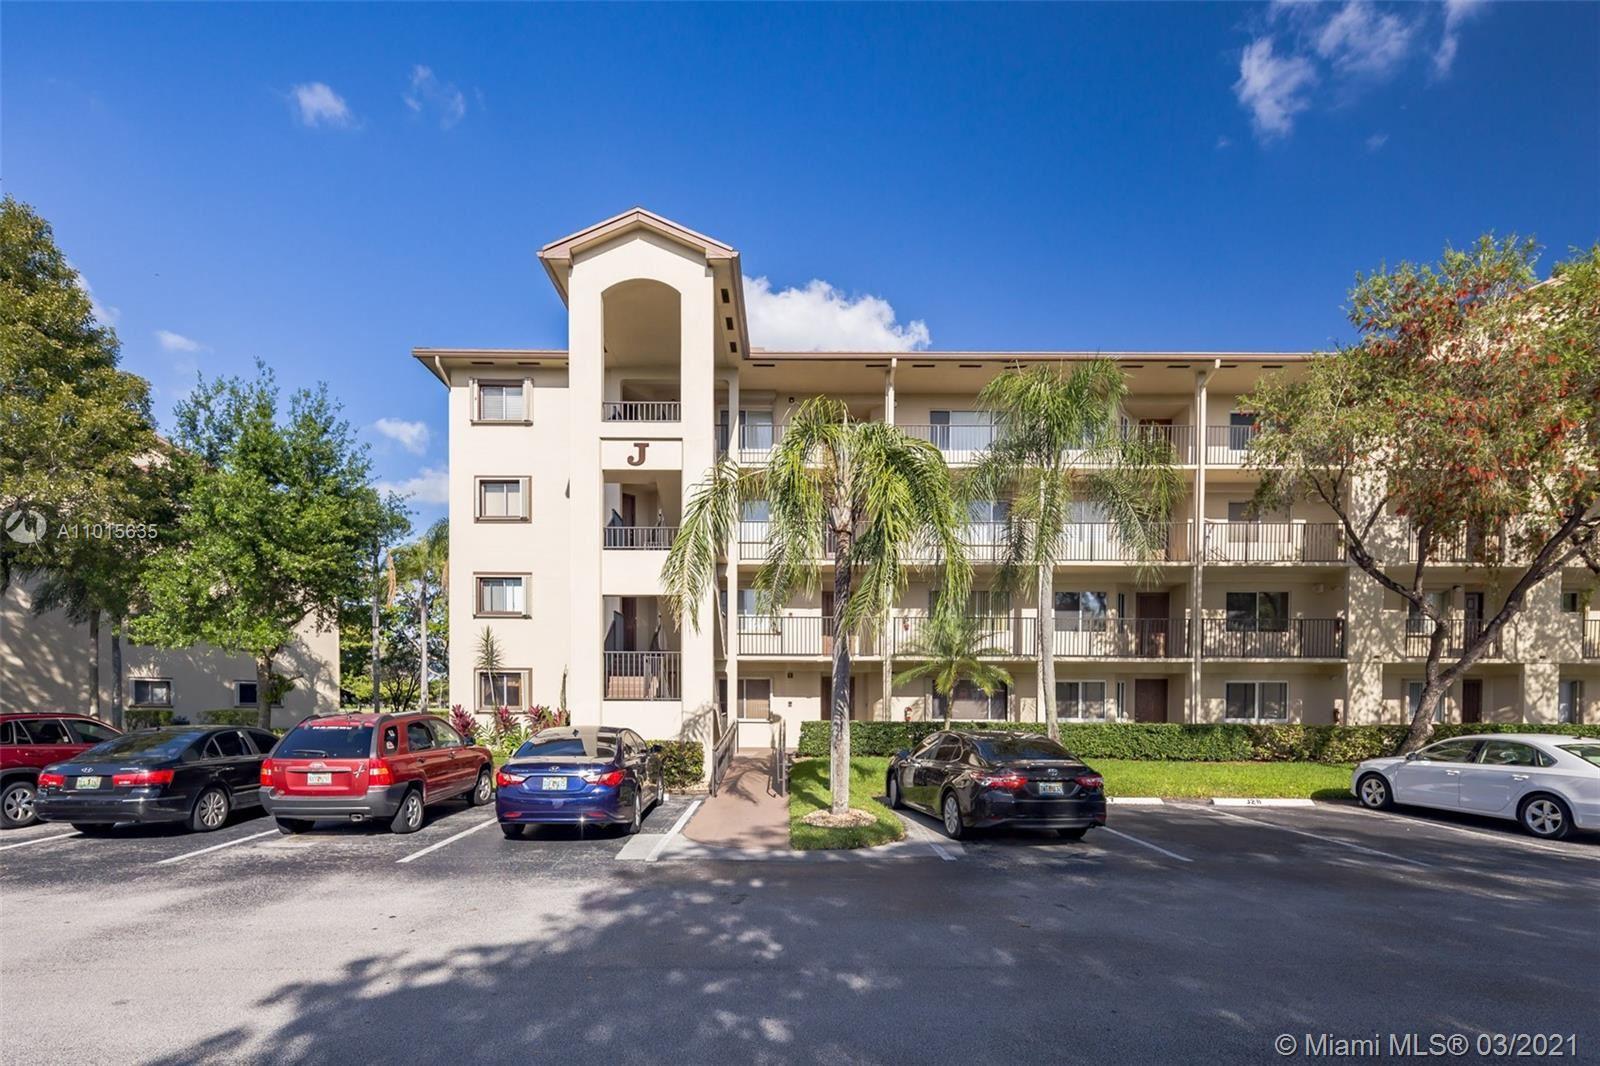 1201 SW 141st Ave #202J, Pembroke Pines, FL 33027 - #: A11015635